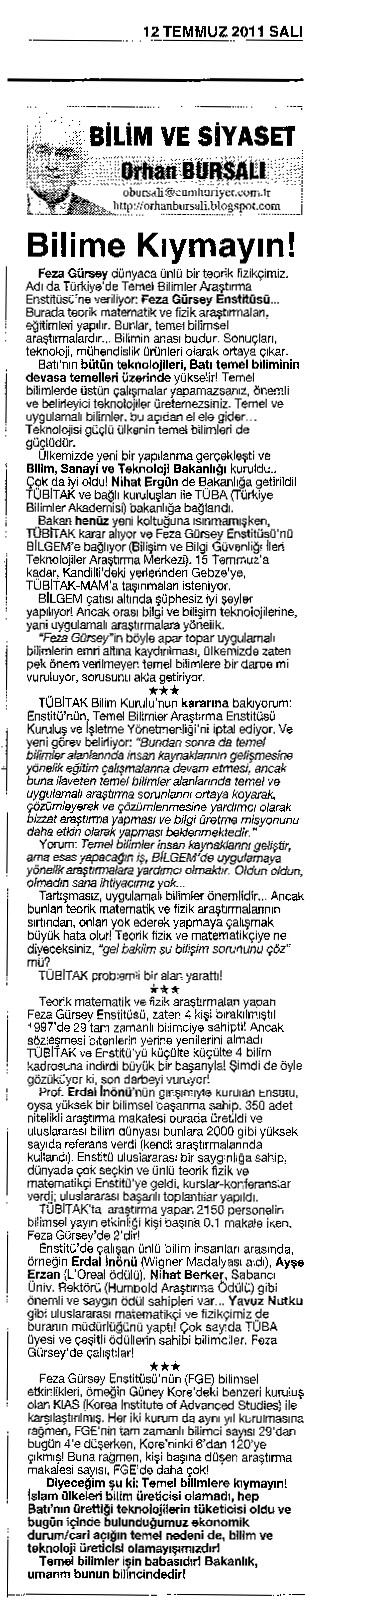 Cumhuriyet Orhan Bursalı Yazısı